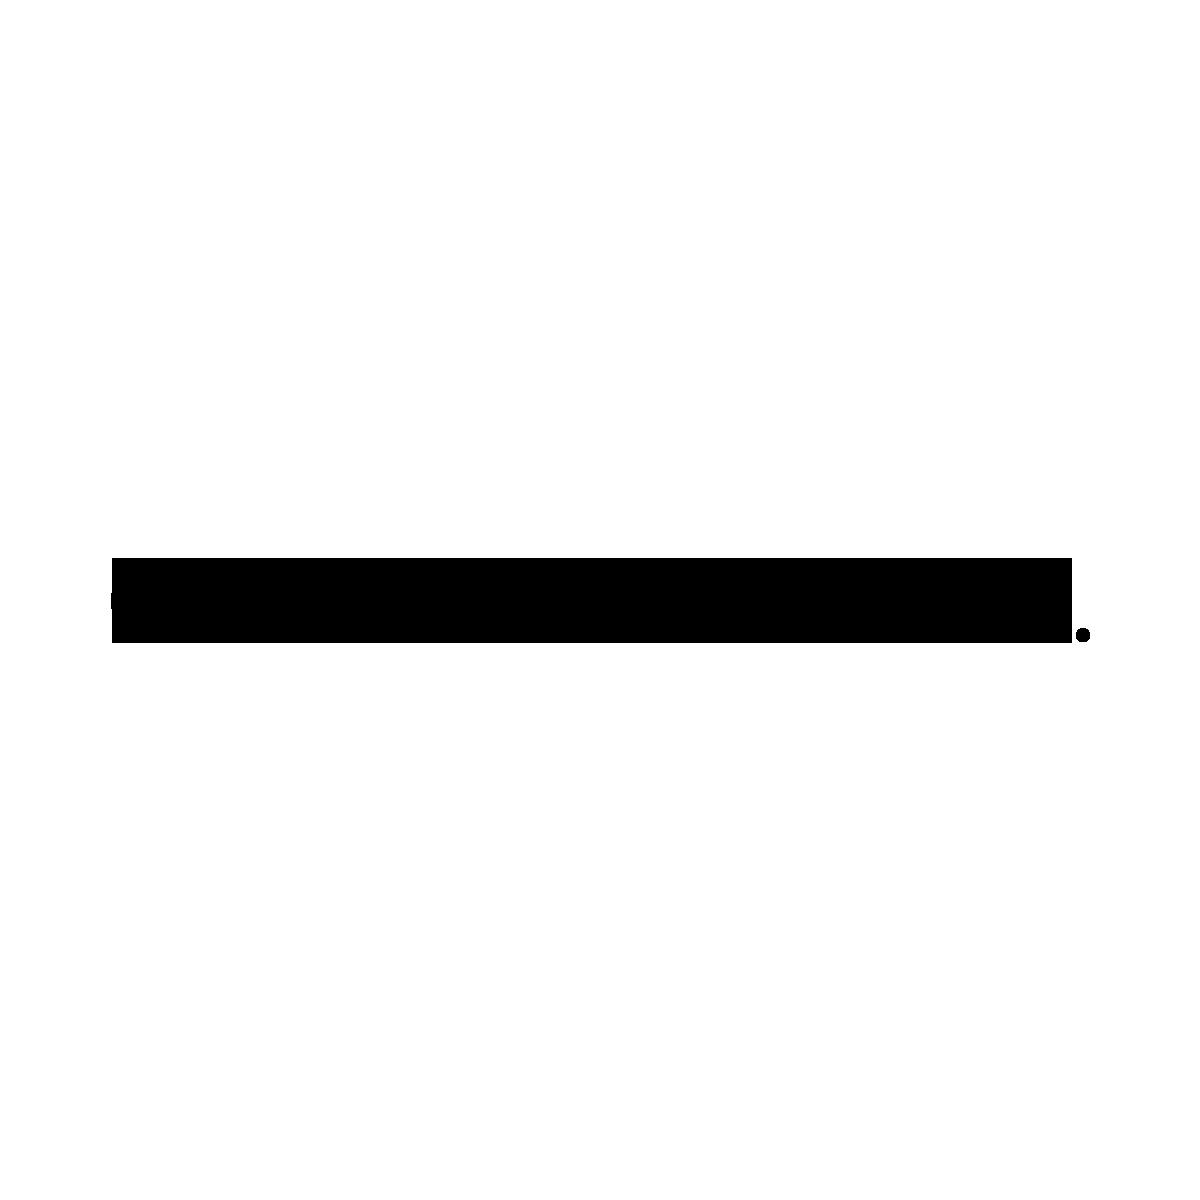 fred de la bretoniere suède handtas in taupe kleur met magneetsluiting 212010007 binnenkant steekvakken